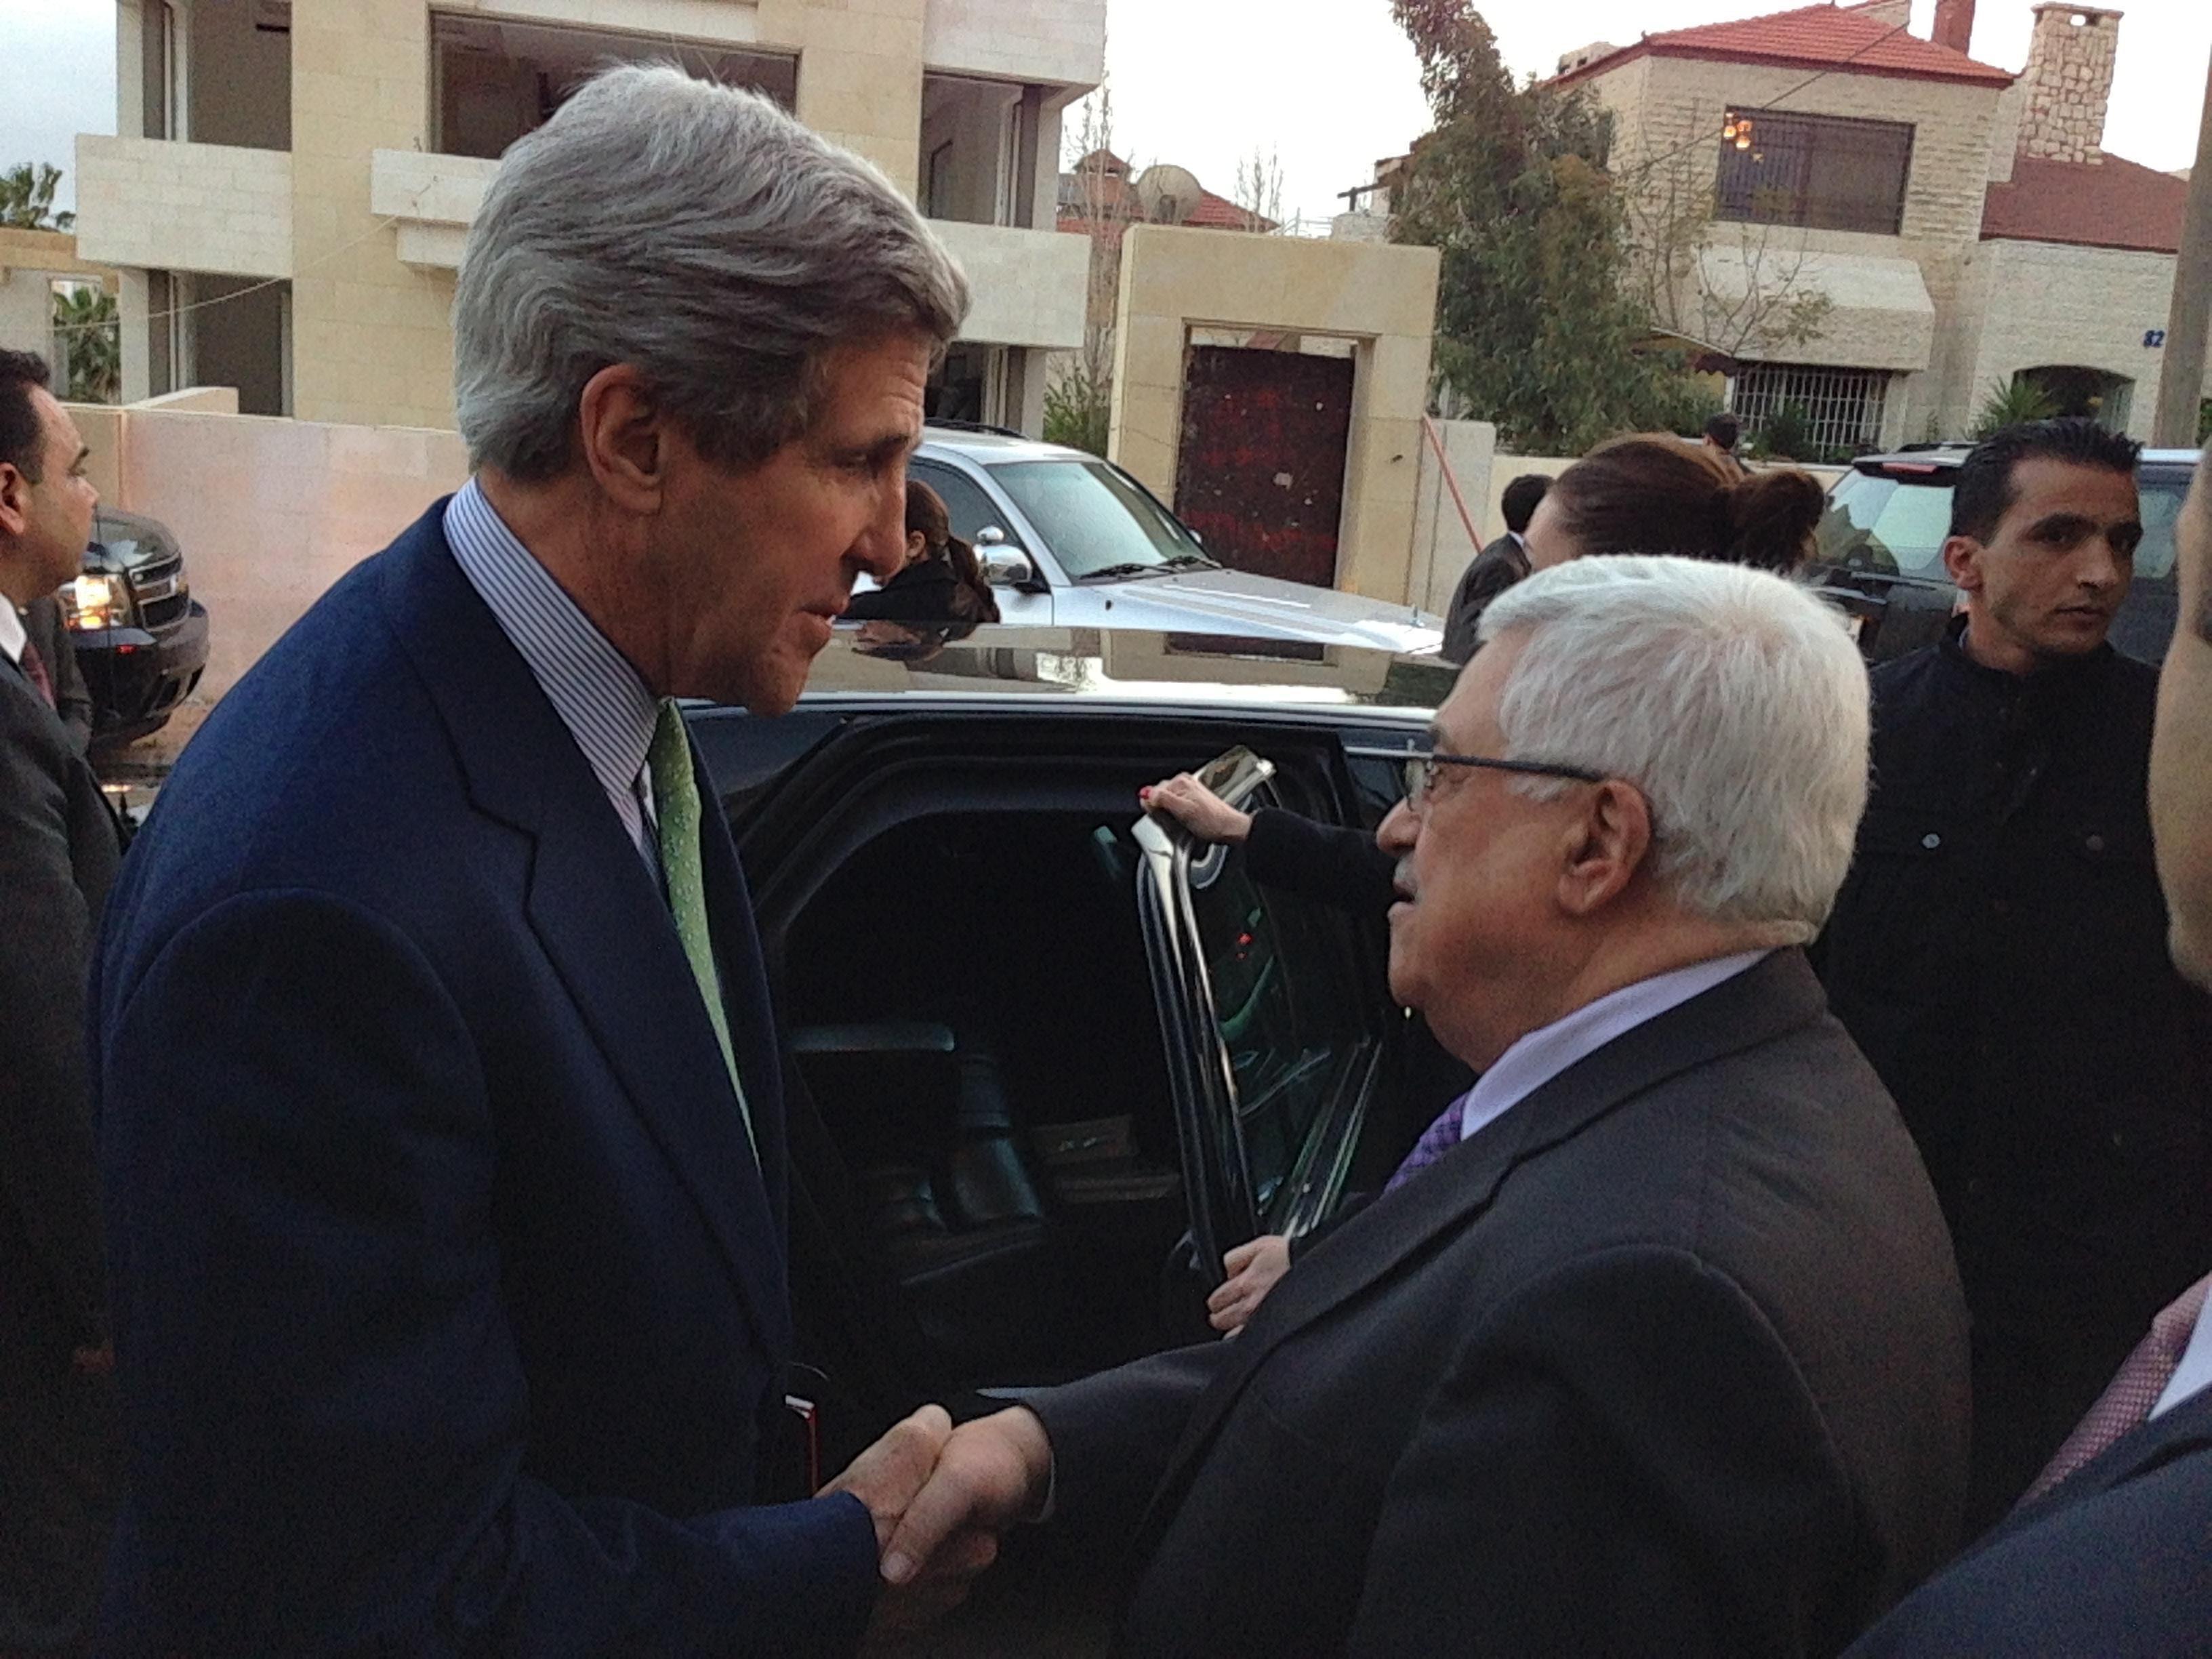 http://upload.wikimedia.org/wikipedia/commons/6/67/Secretary_Kerry_Bids_Farewell_to_Palestinian_President_Abbas_in_Amman.jpg